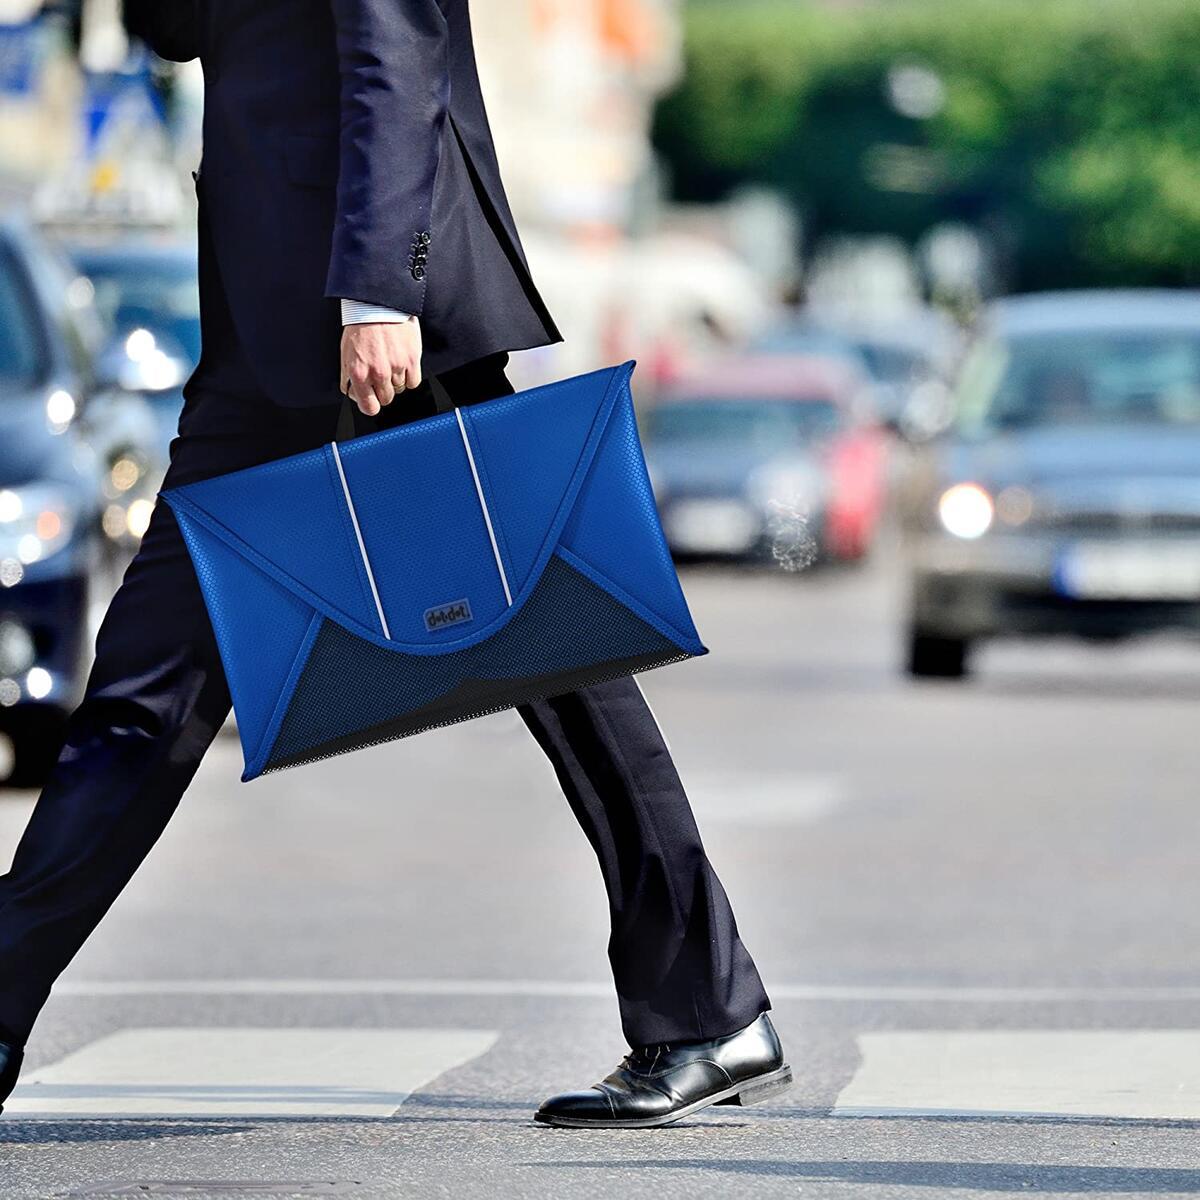 Dot&Dot 18 Inches Packing Folder Backpack Accessory to Avoid Wrinkled Clothing (Dark Blue)